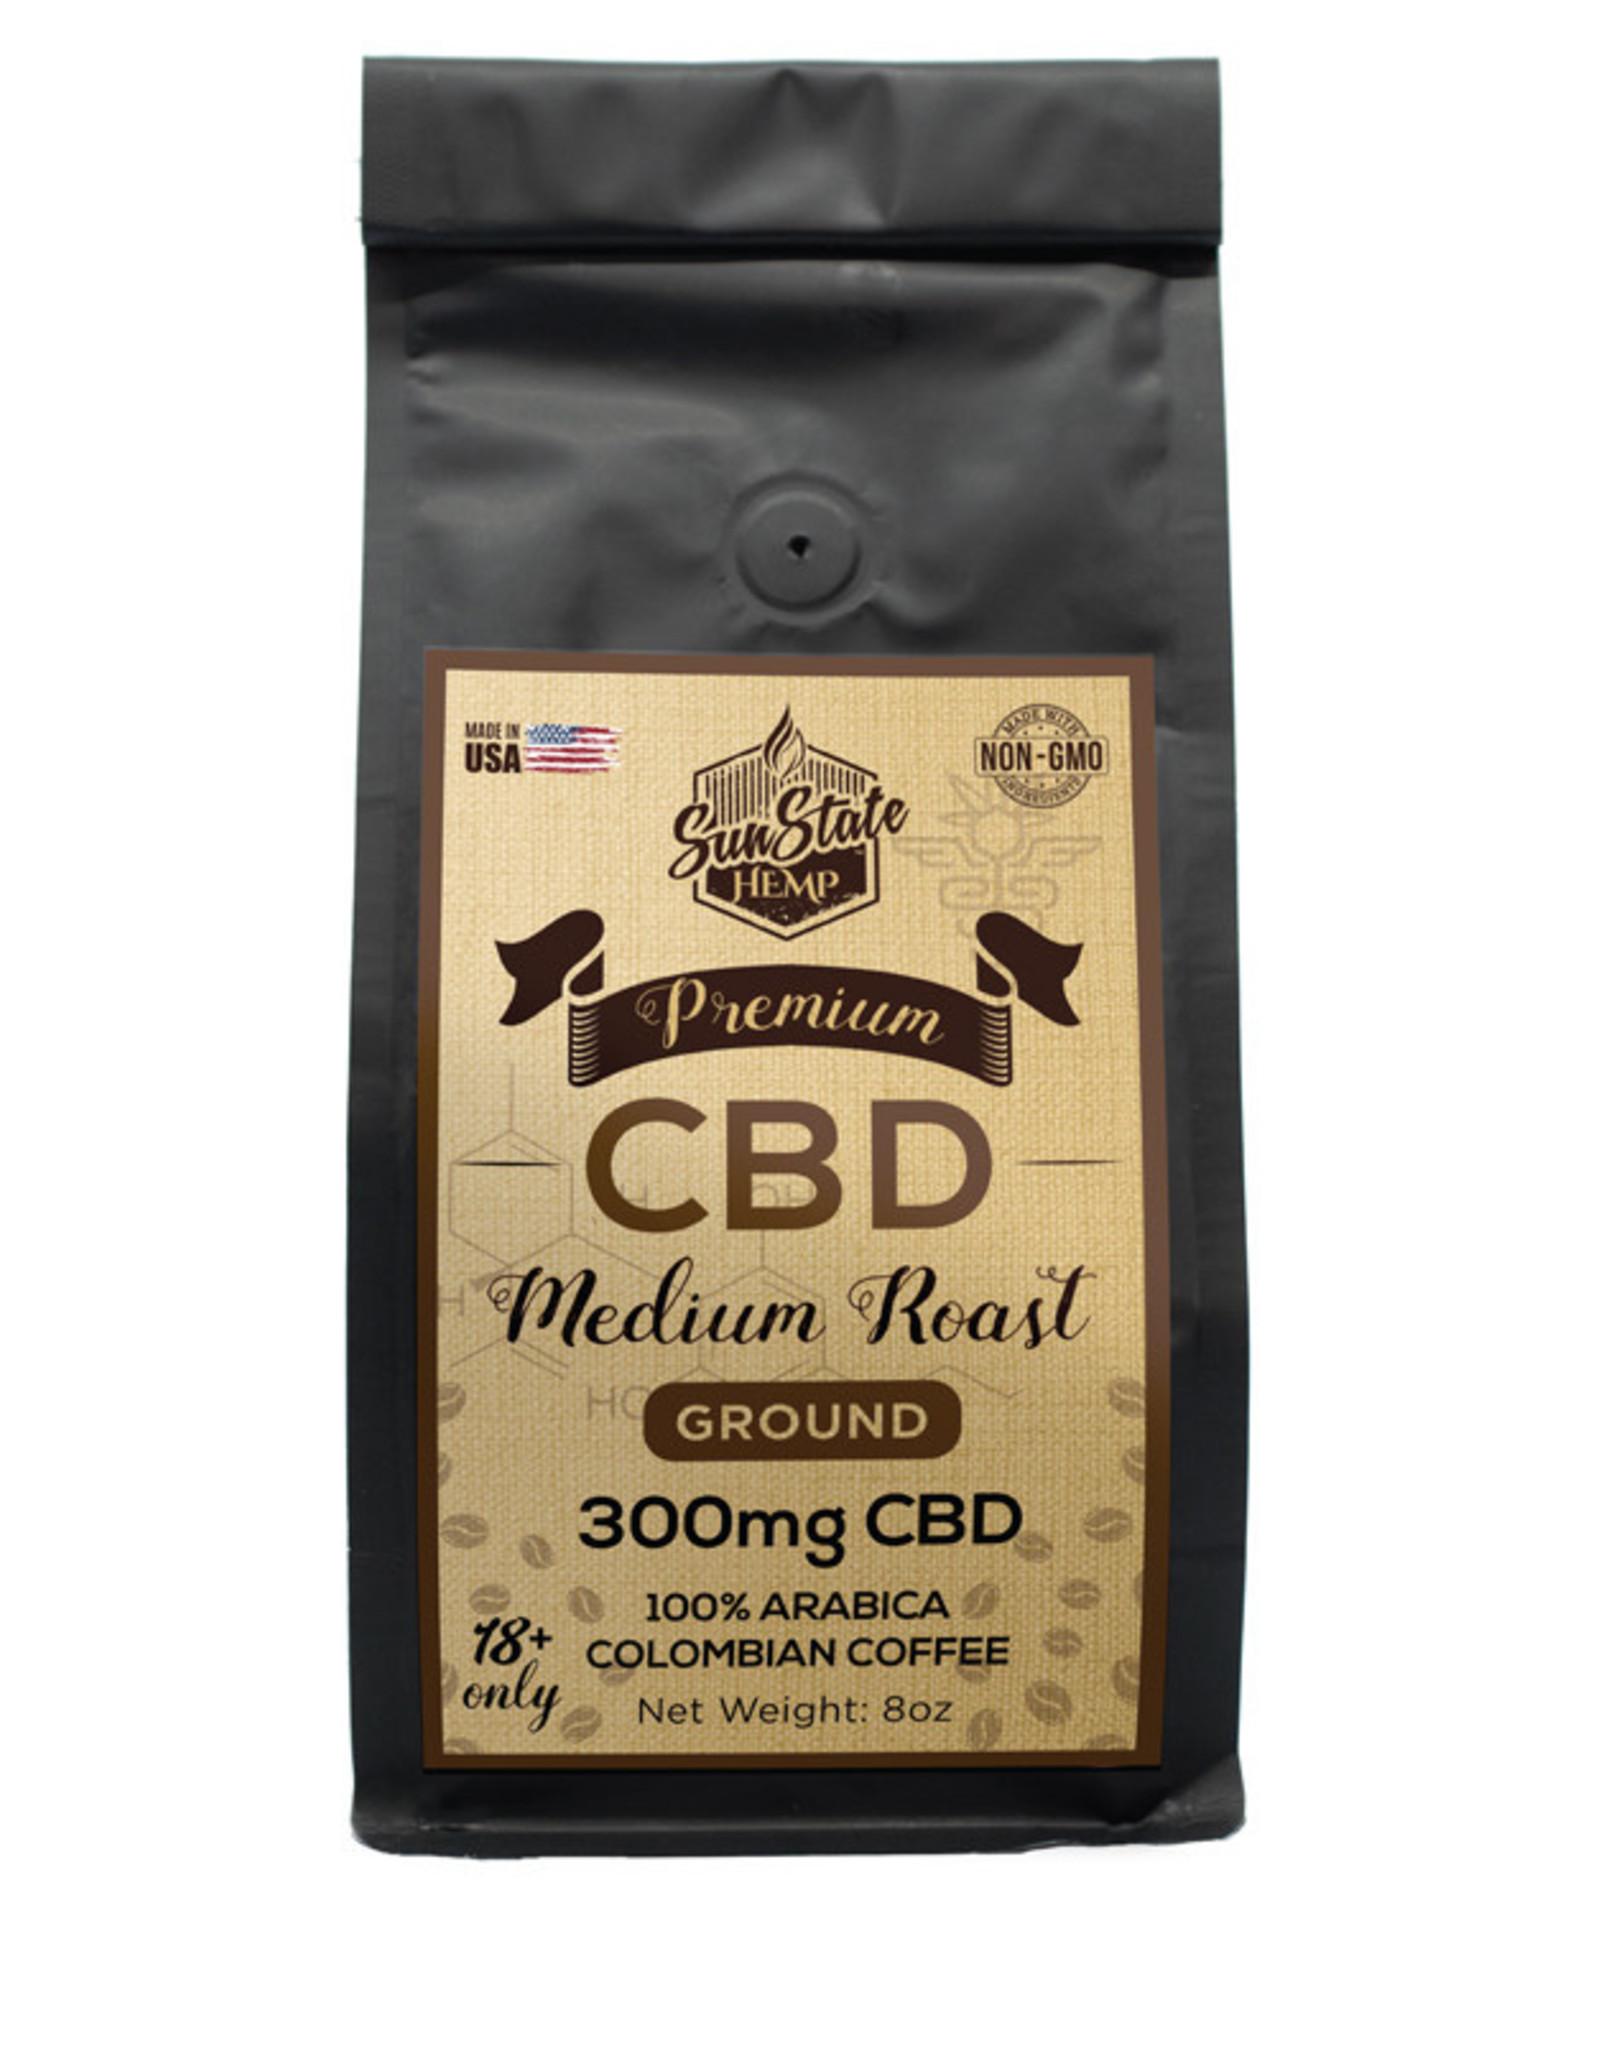 Sun State 8oz Medium Roast Coffee 300mg